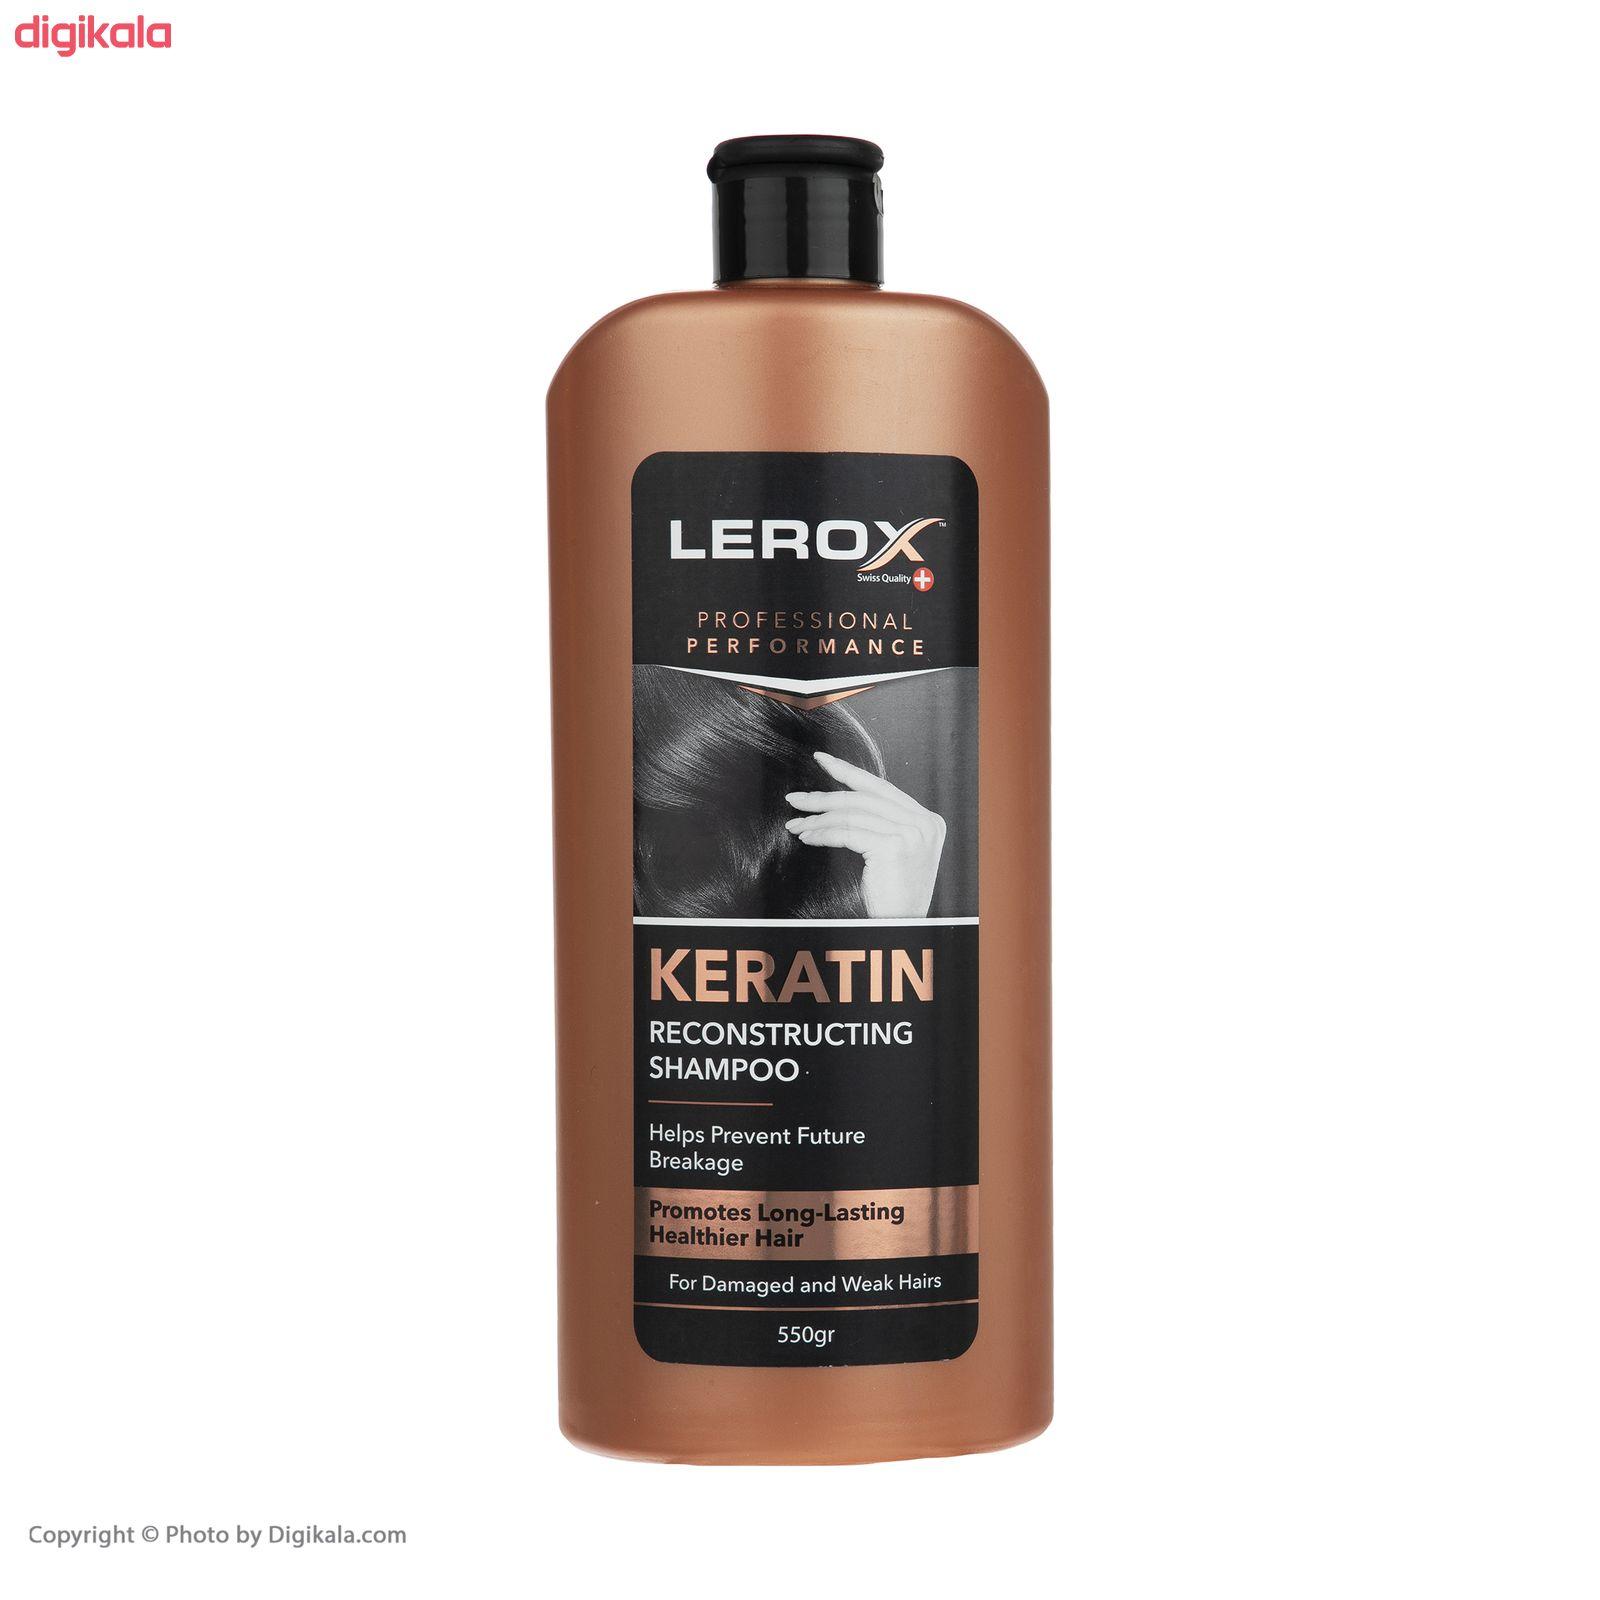 شامپو کراتینه مو لروکس مدل Aloevera مقدار 550 گرم main 1 3